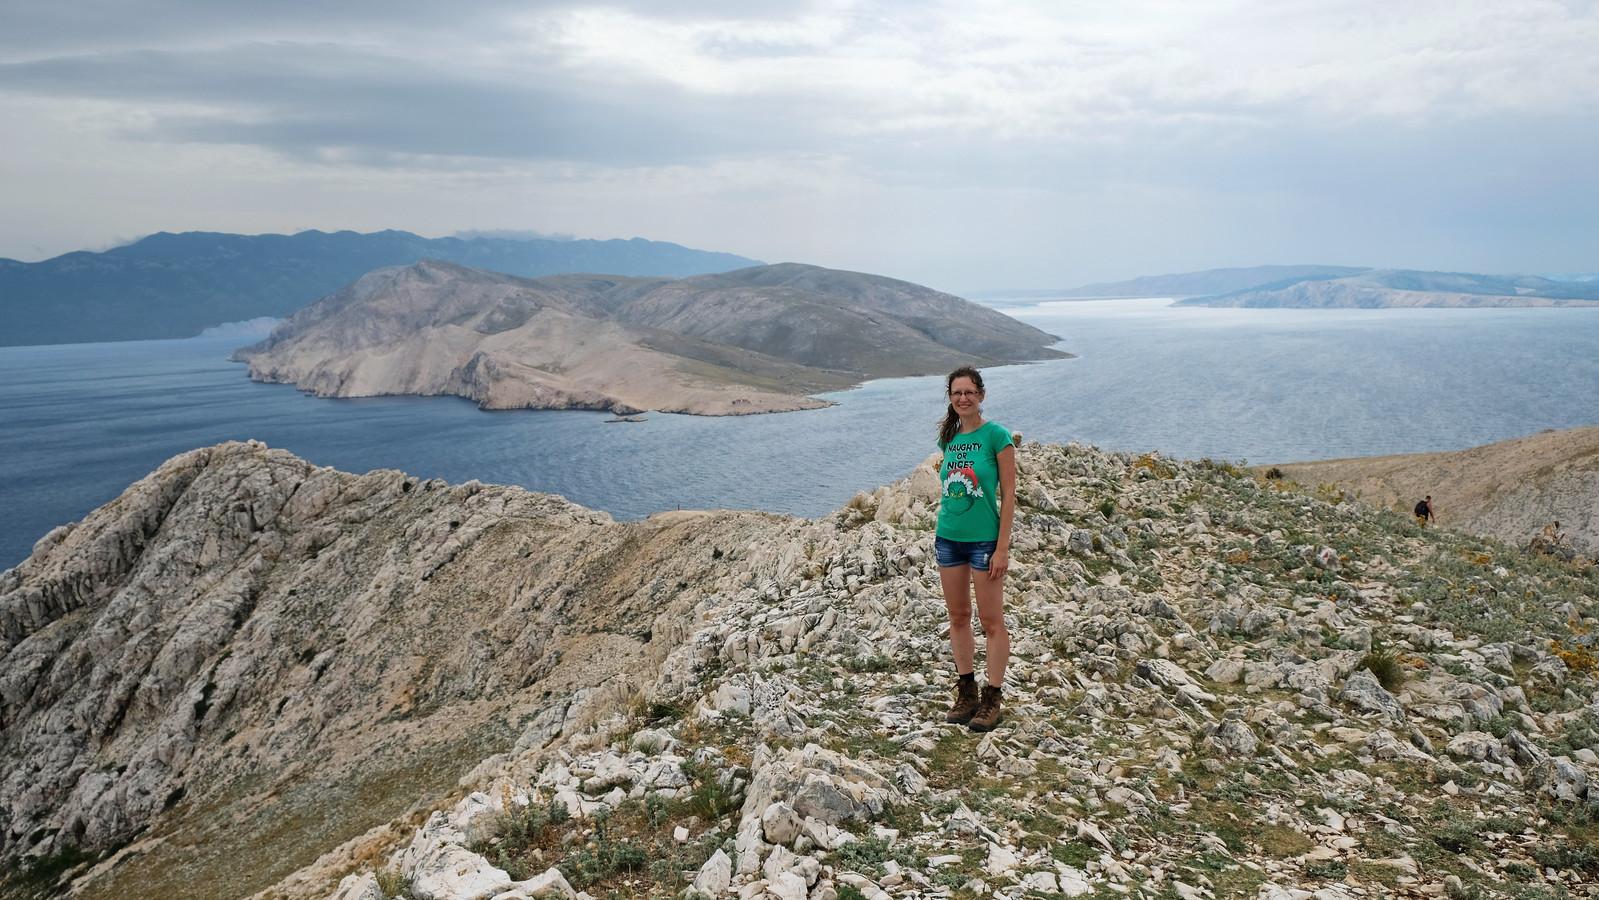 Bag viewpoint, Krk Island, Croatia